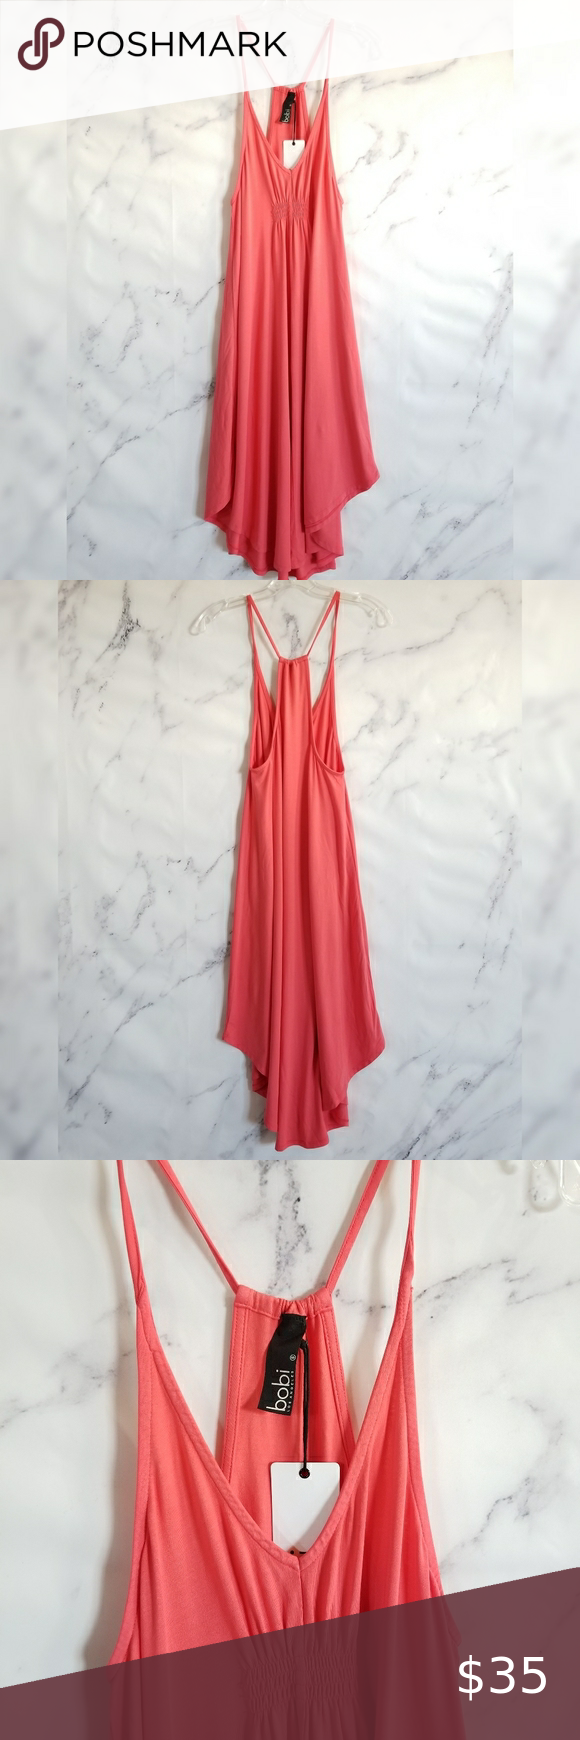 Bobi La Spaghetti Strap Racerback Midi Dress In 2020 Racerback Midi Dress Racerback Maxi Dress Clothes Design [ 1740 x 580 Pixel ]